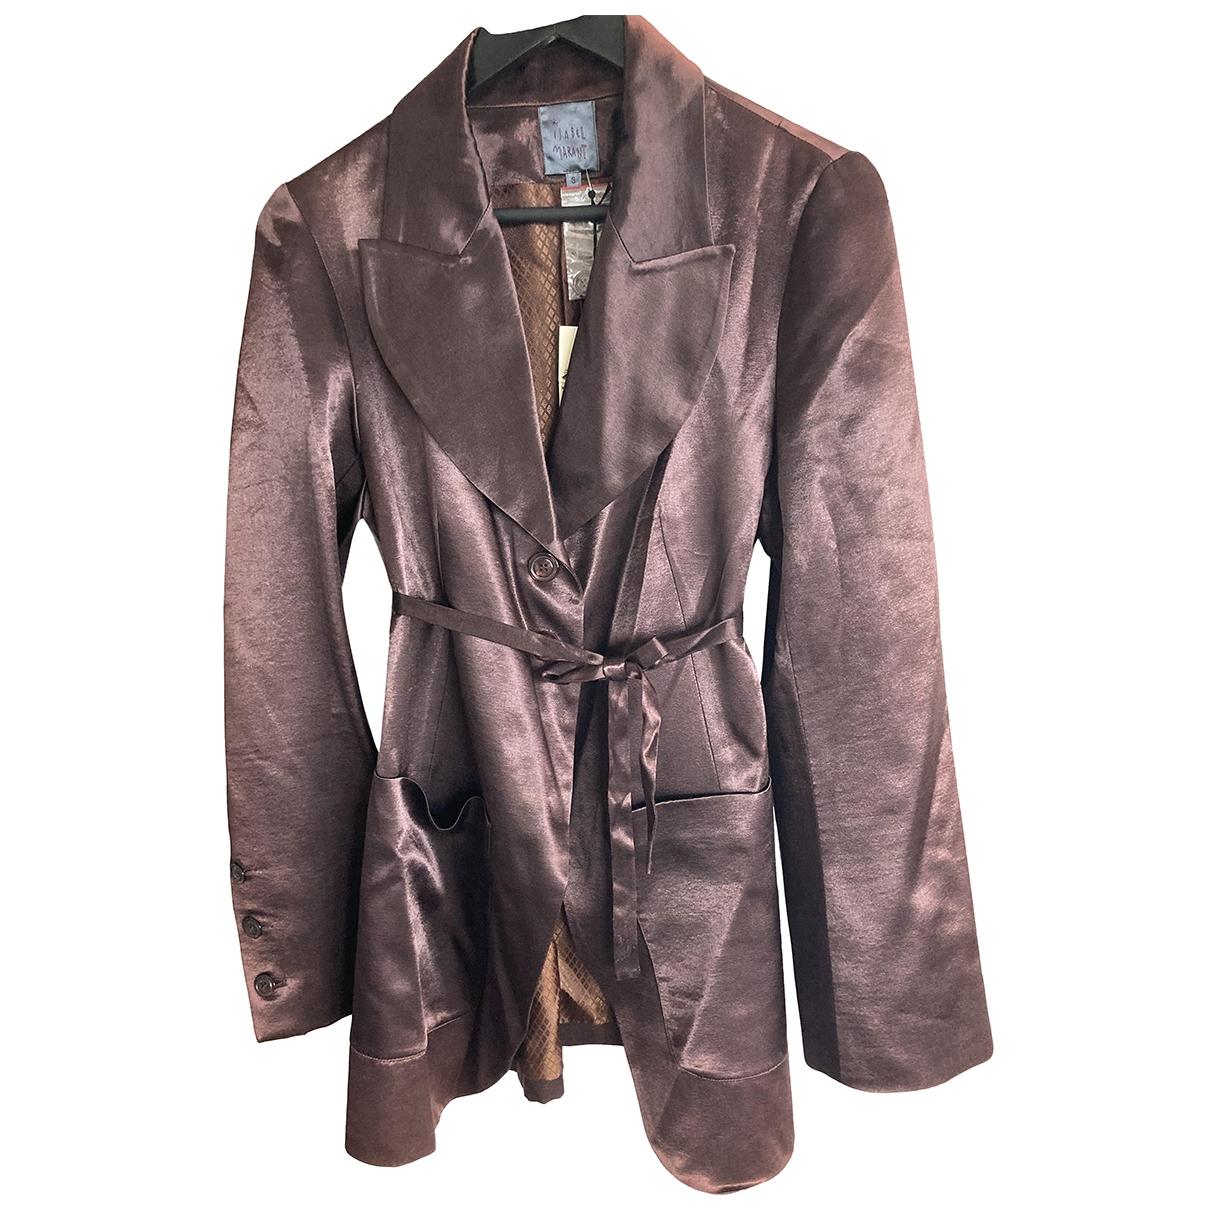 Isabel Marant \N Brown jacket for Women 3 0-5